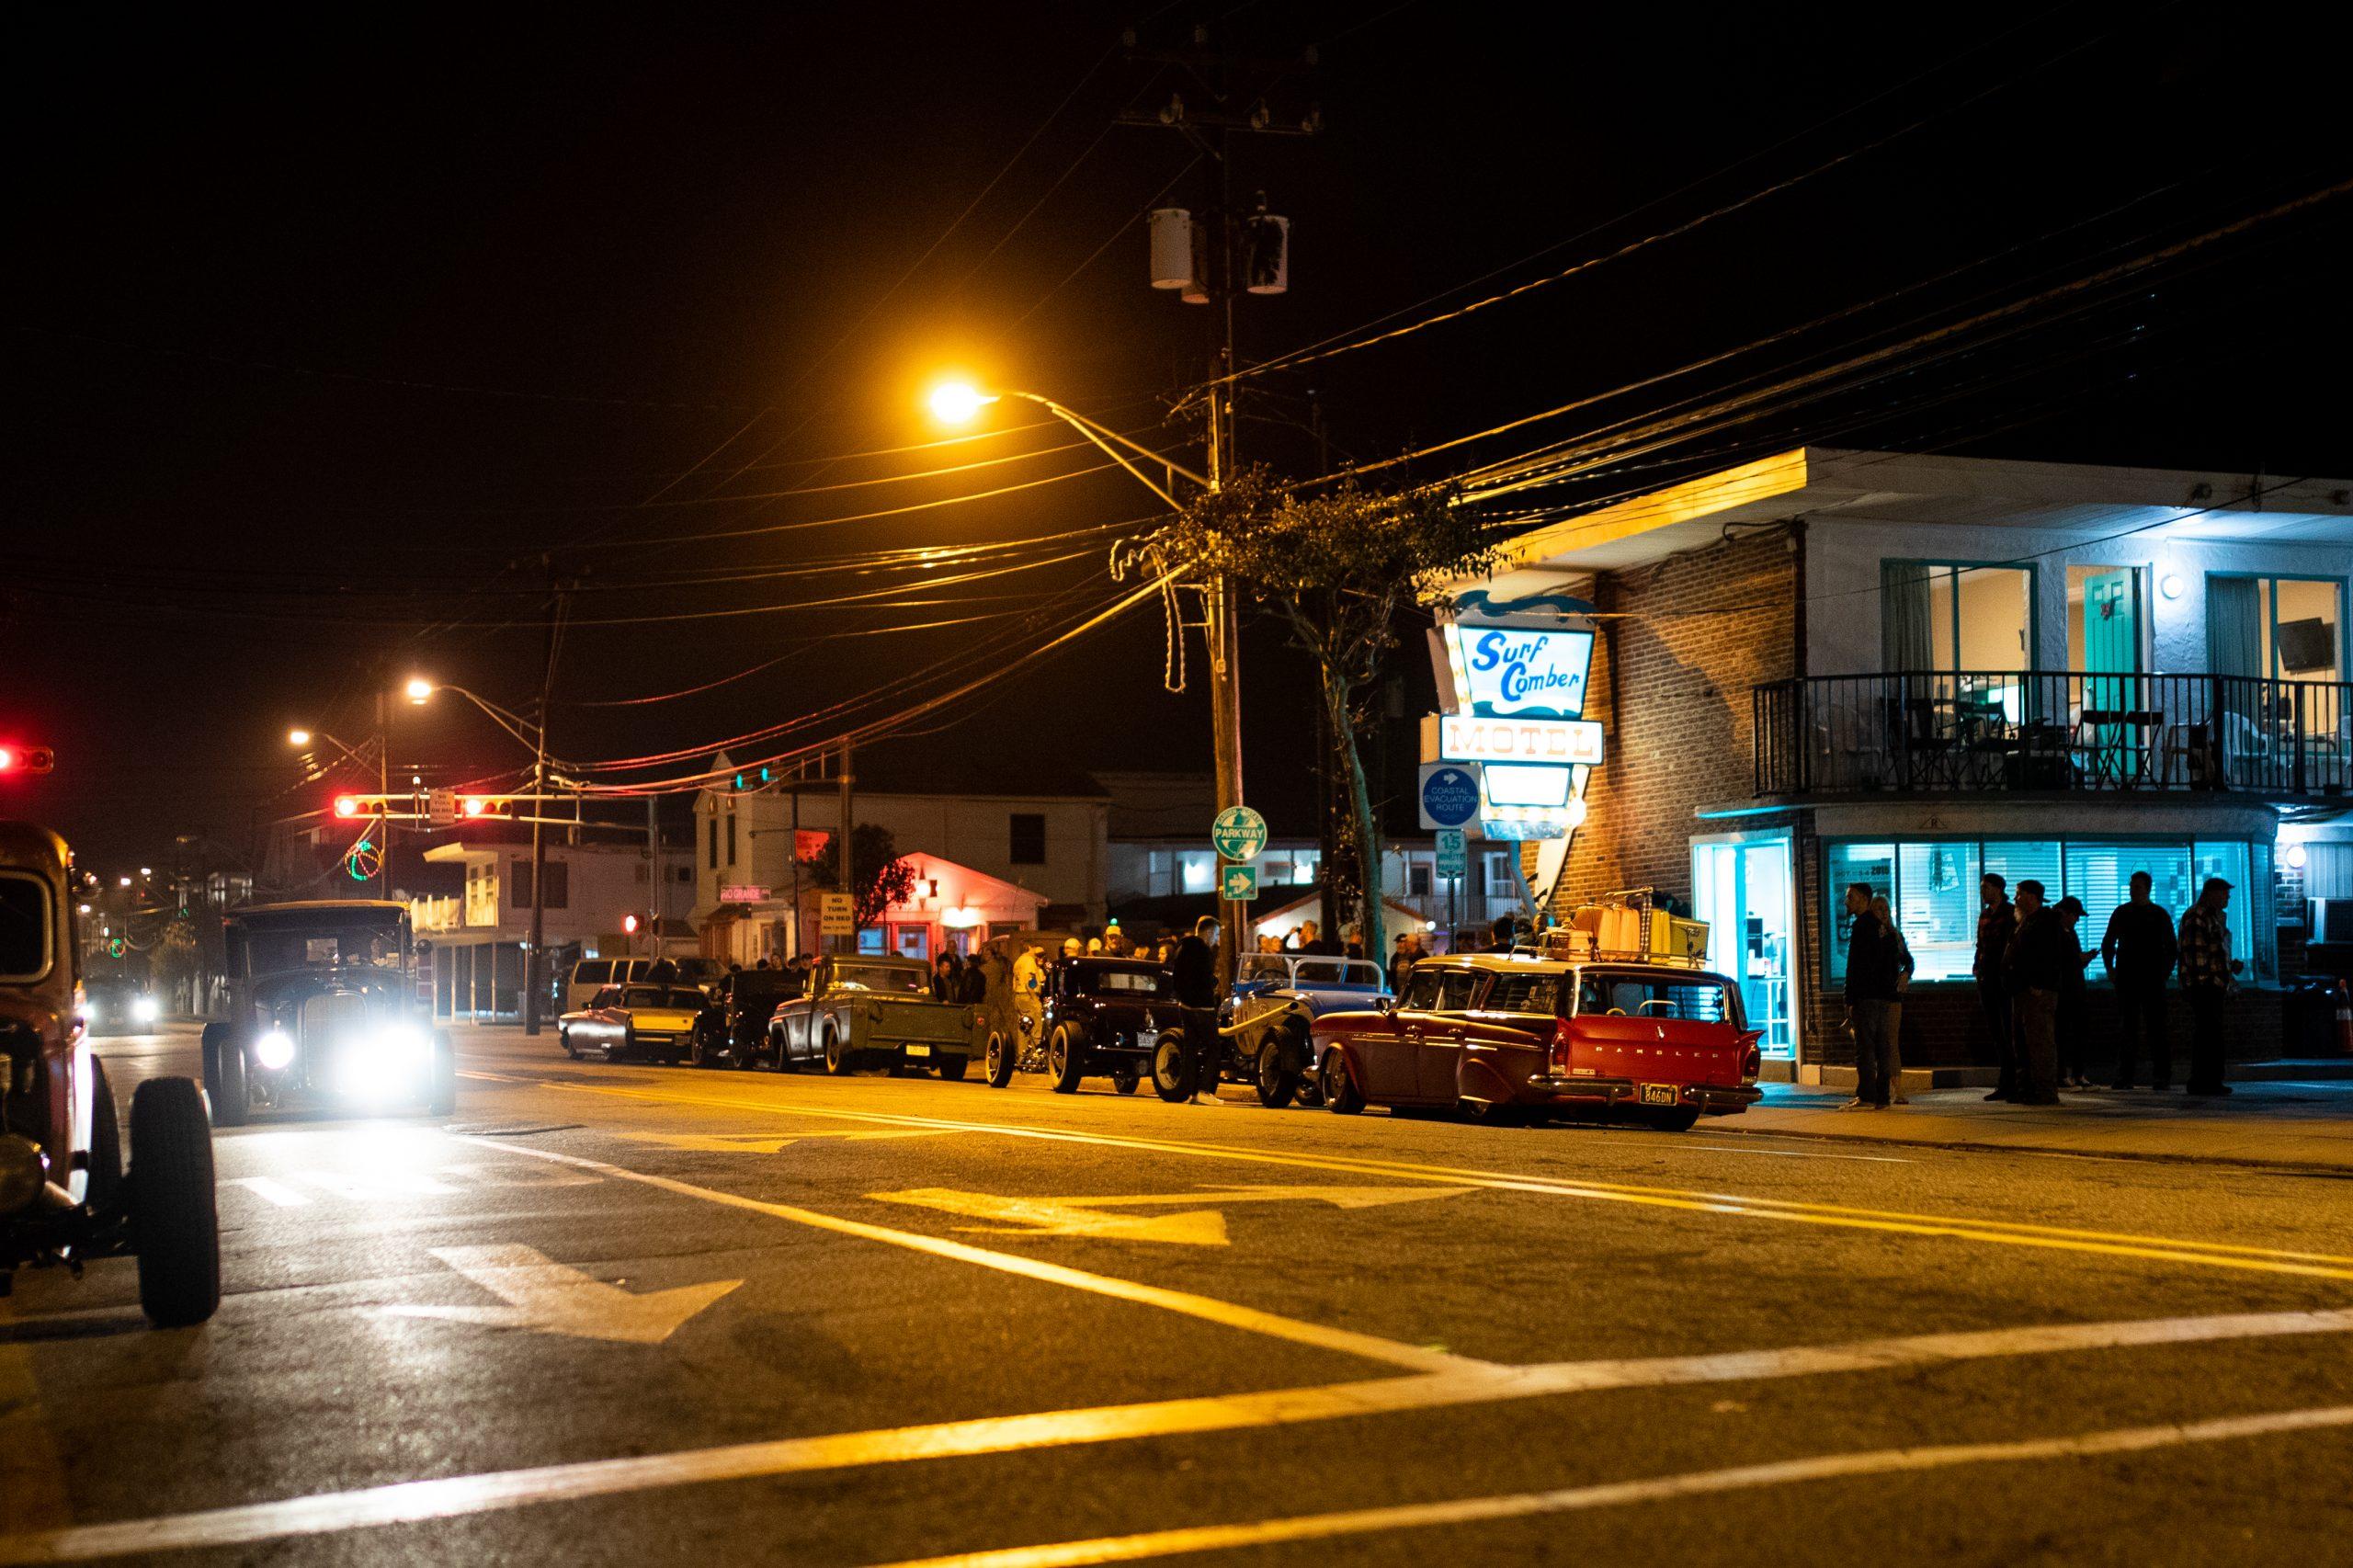 hot rod lined street at night